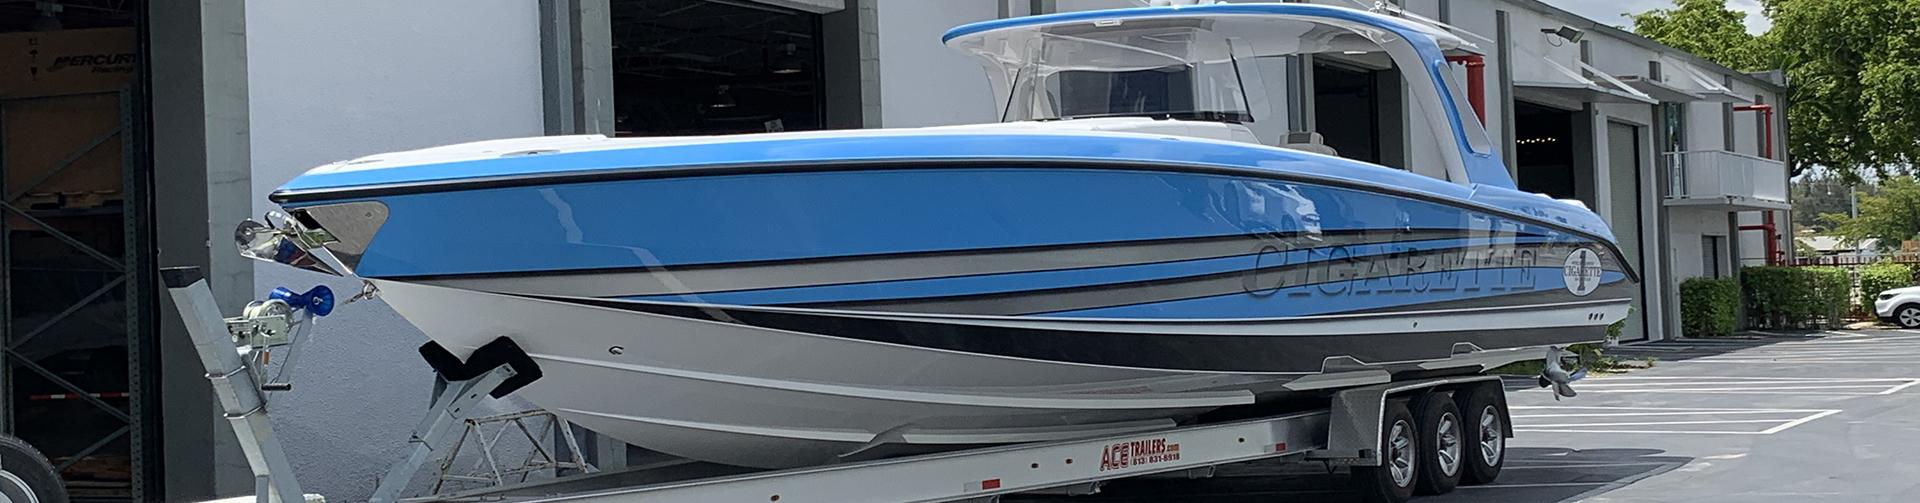 Indiana Boat Transport